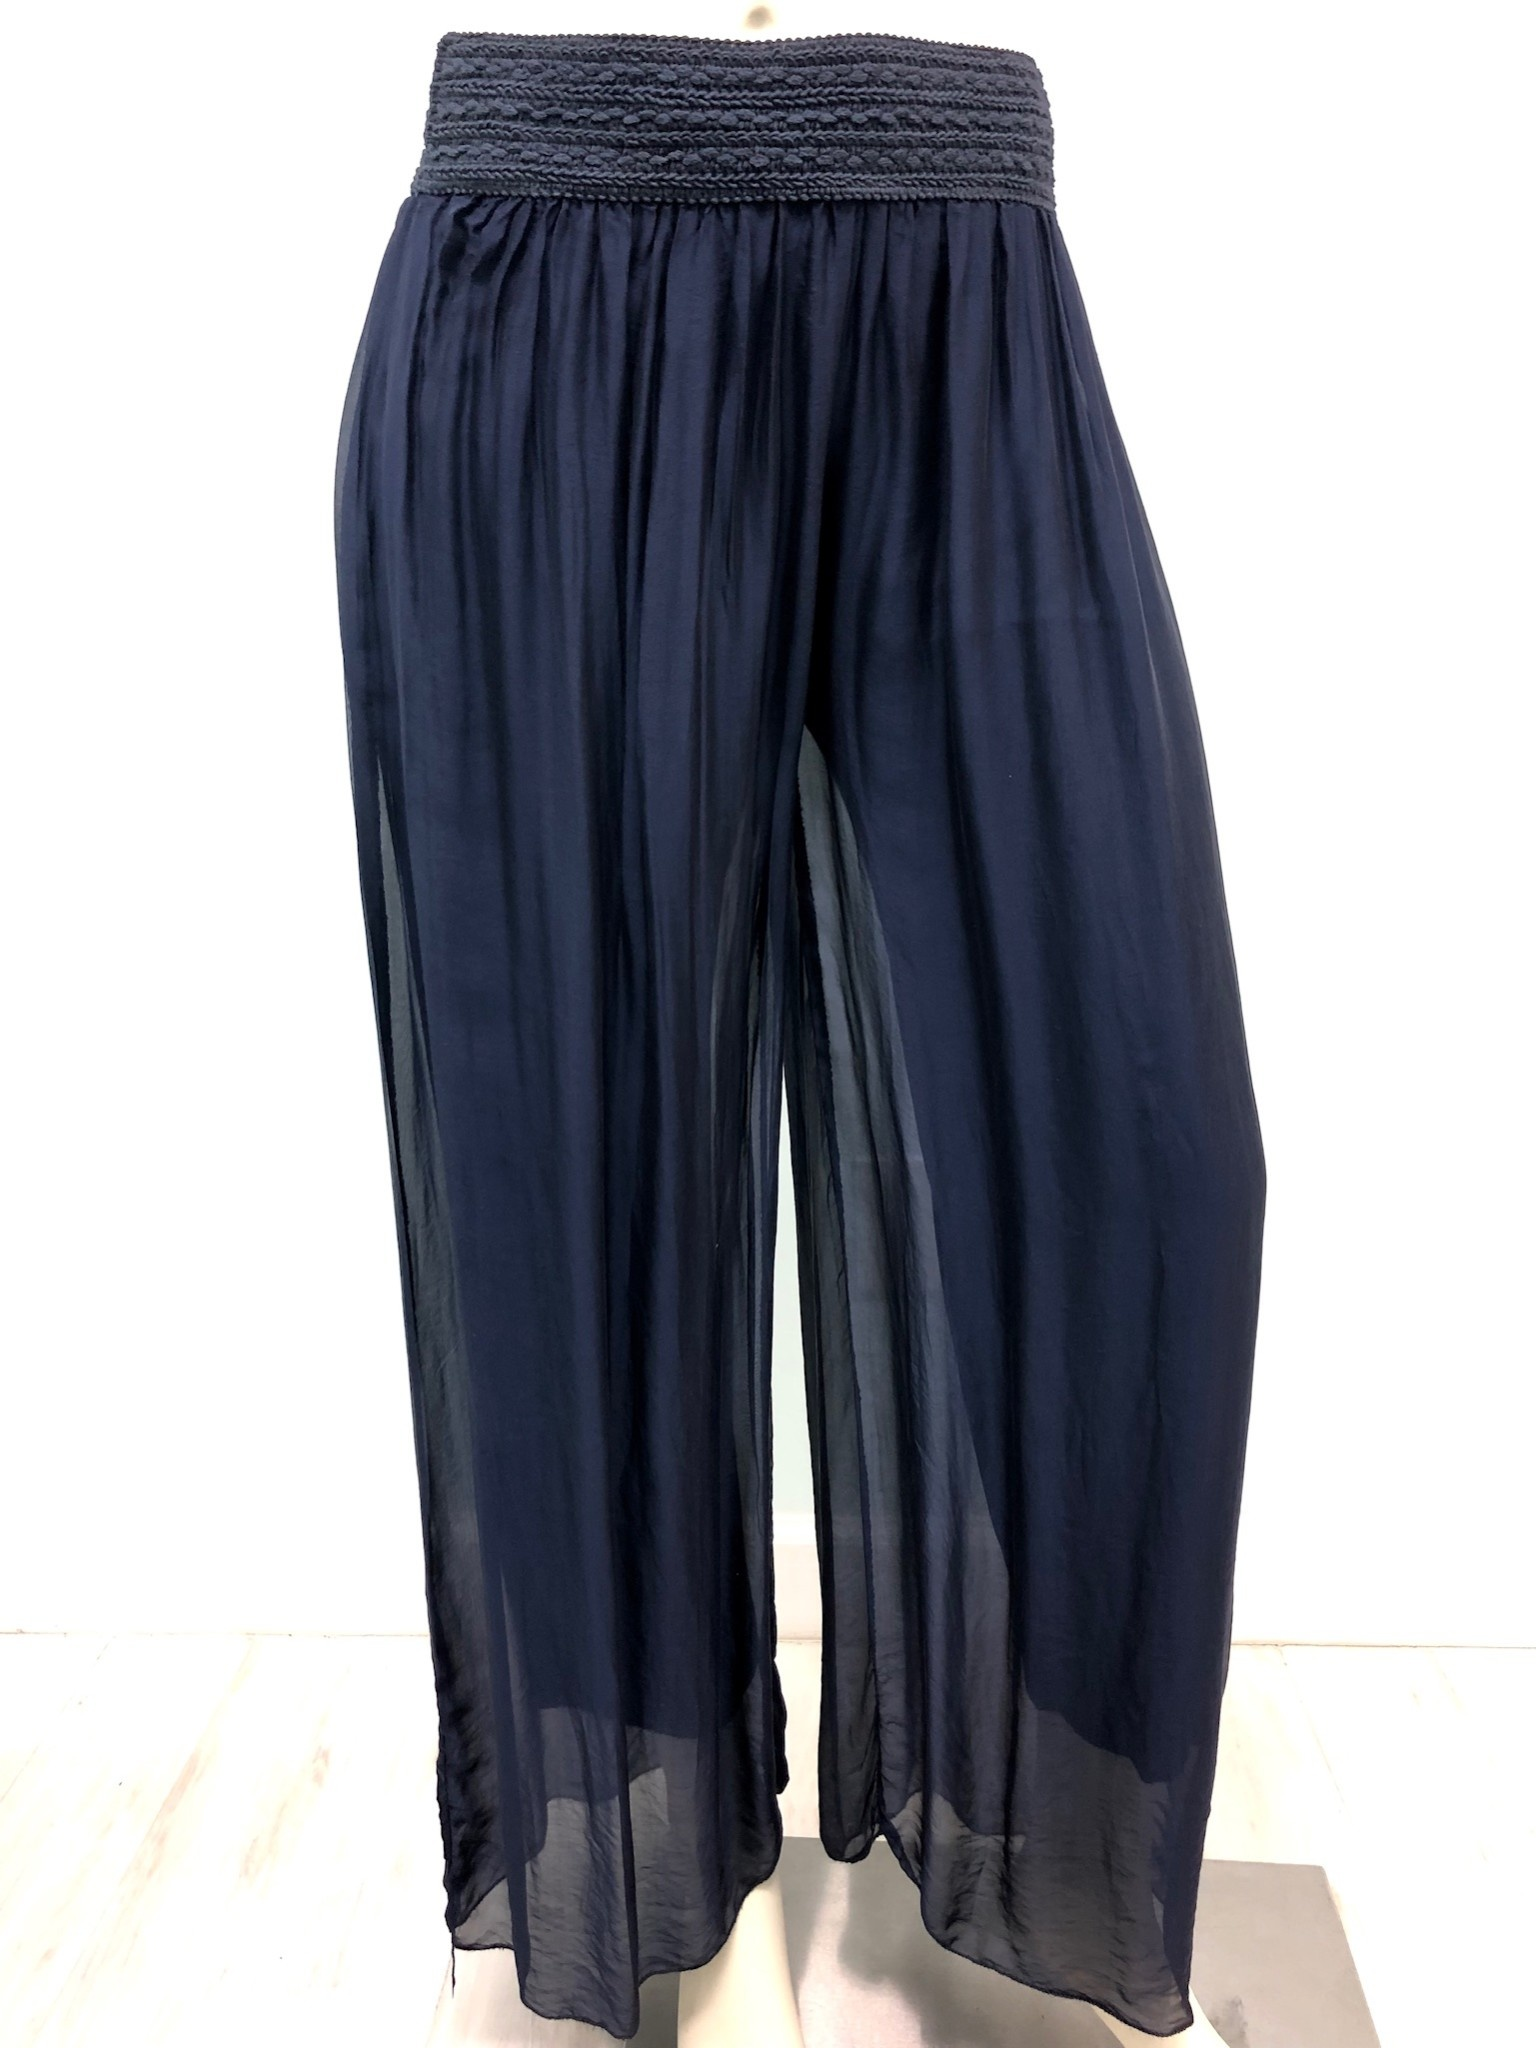 Pura Seta Elastic Navy Silk Lined Pants